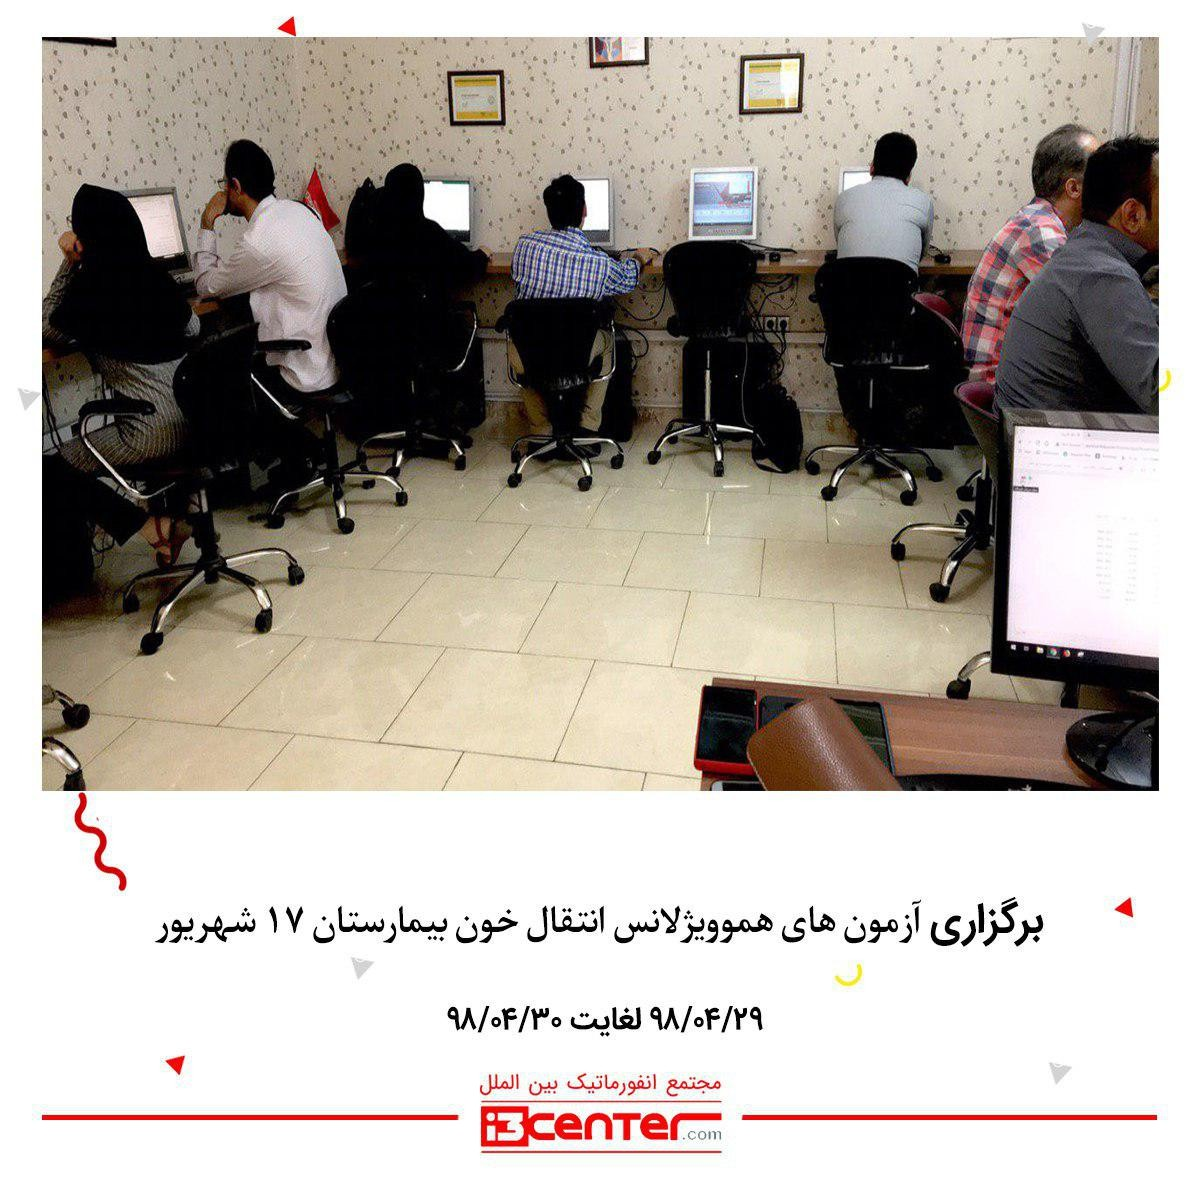 آزمون الکترونیکی انتقال خون در مرکز آزمون مجتمع انفورماتیک بین الملل